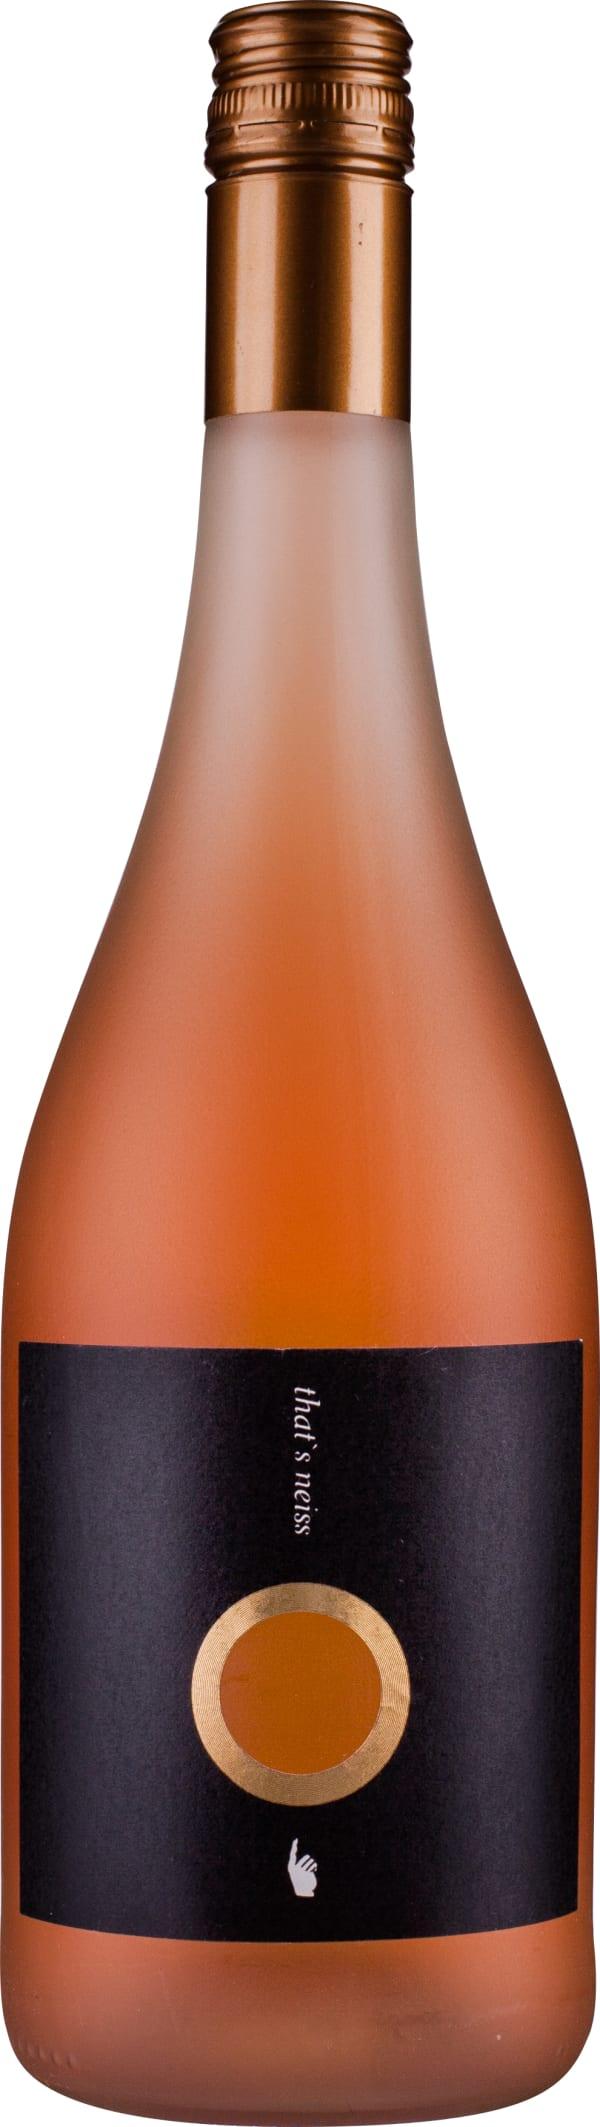 That's Neiss Pinot Noir Rosé Trocken 2016